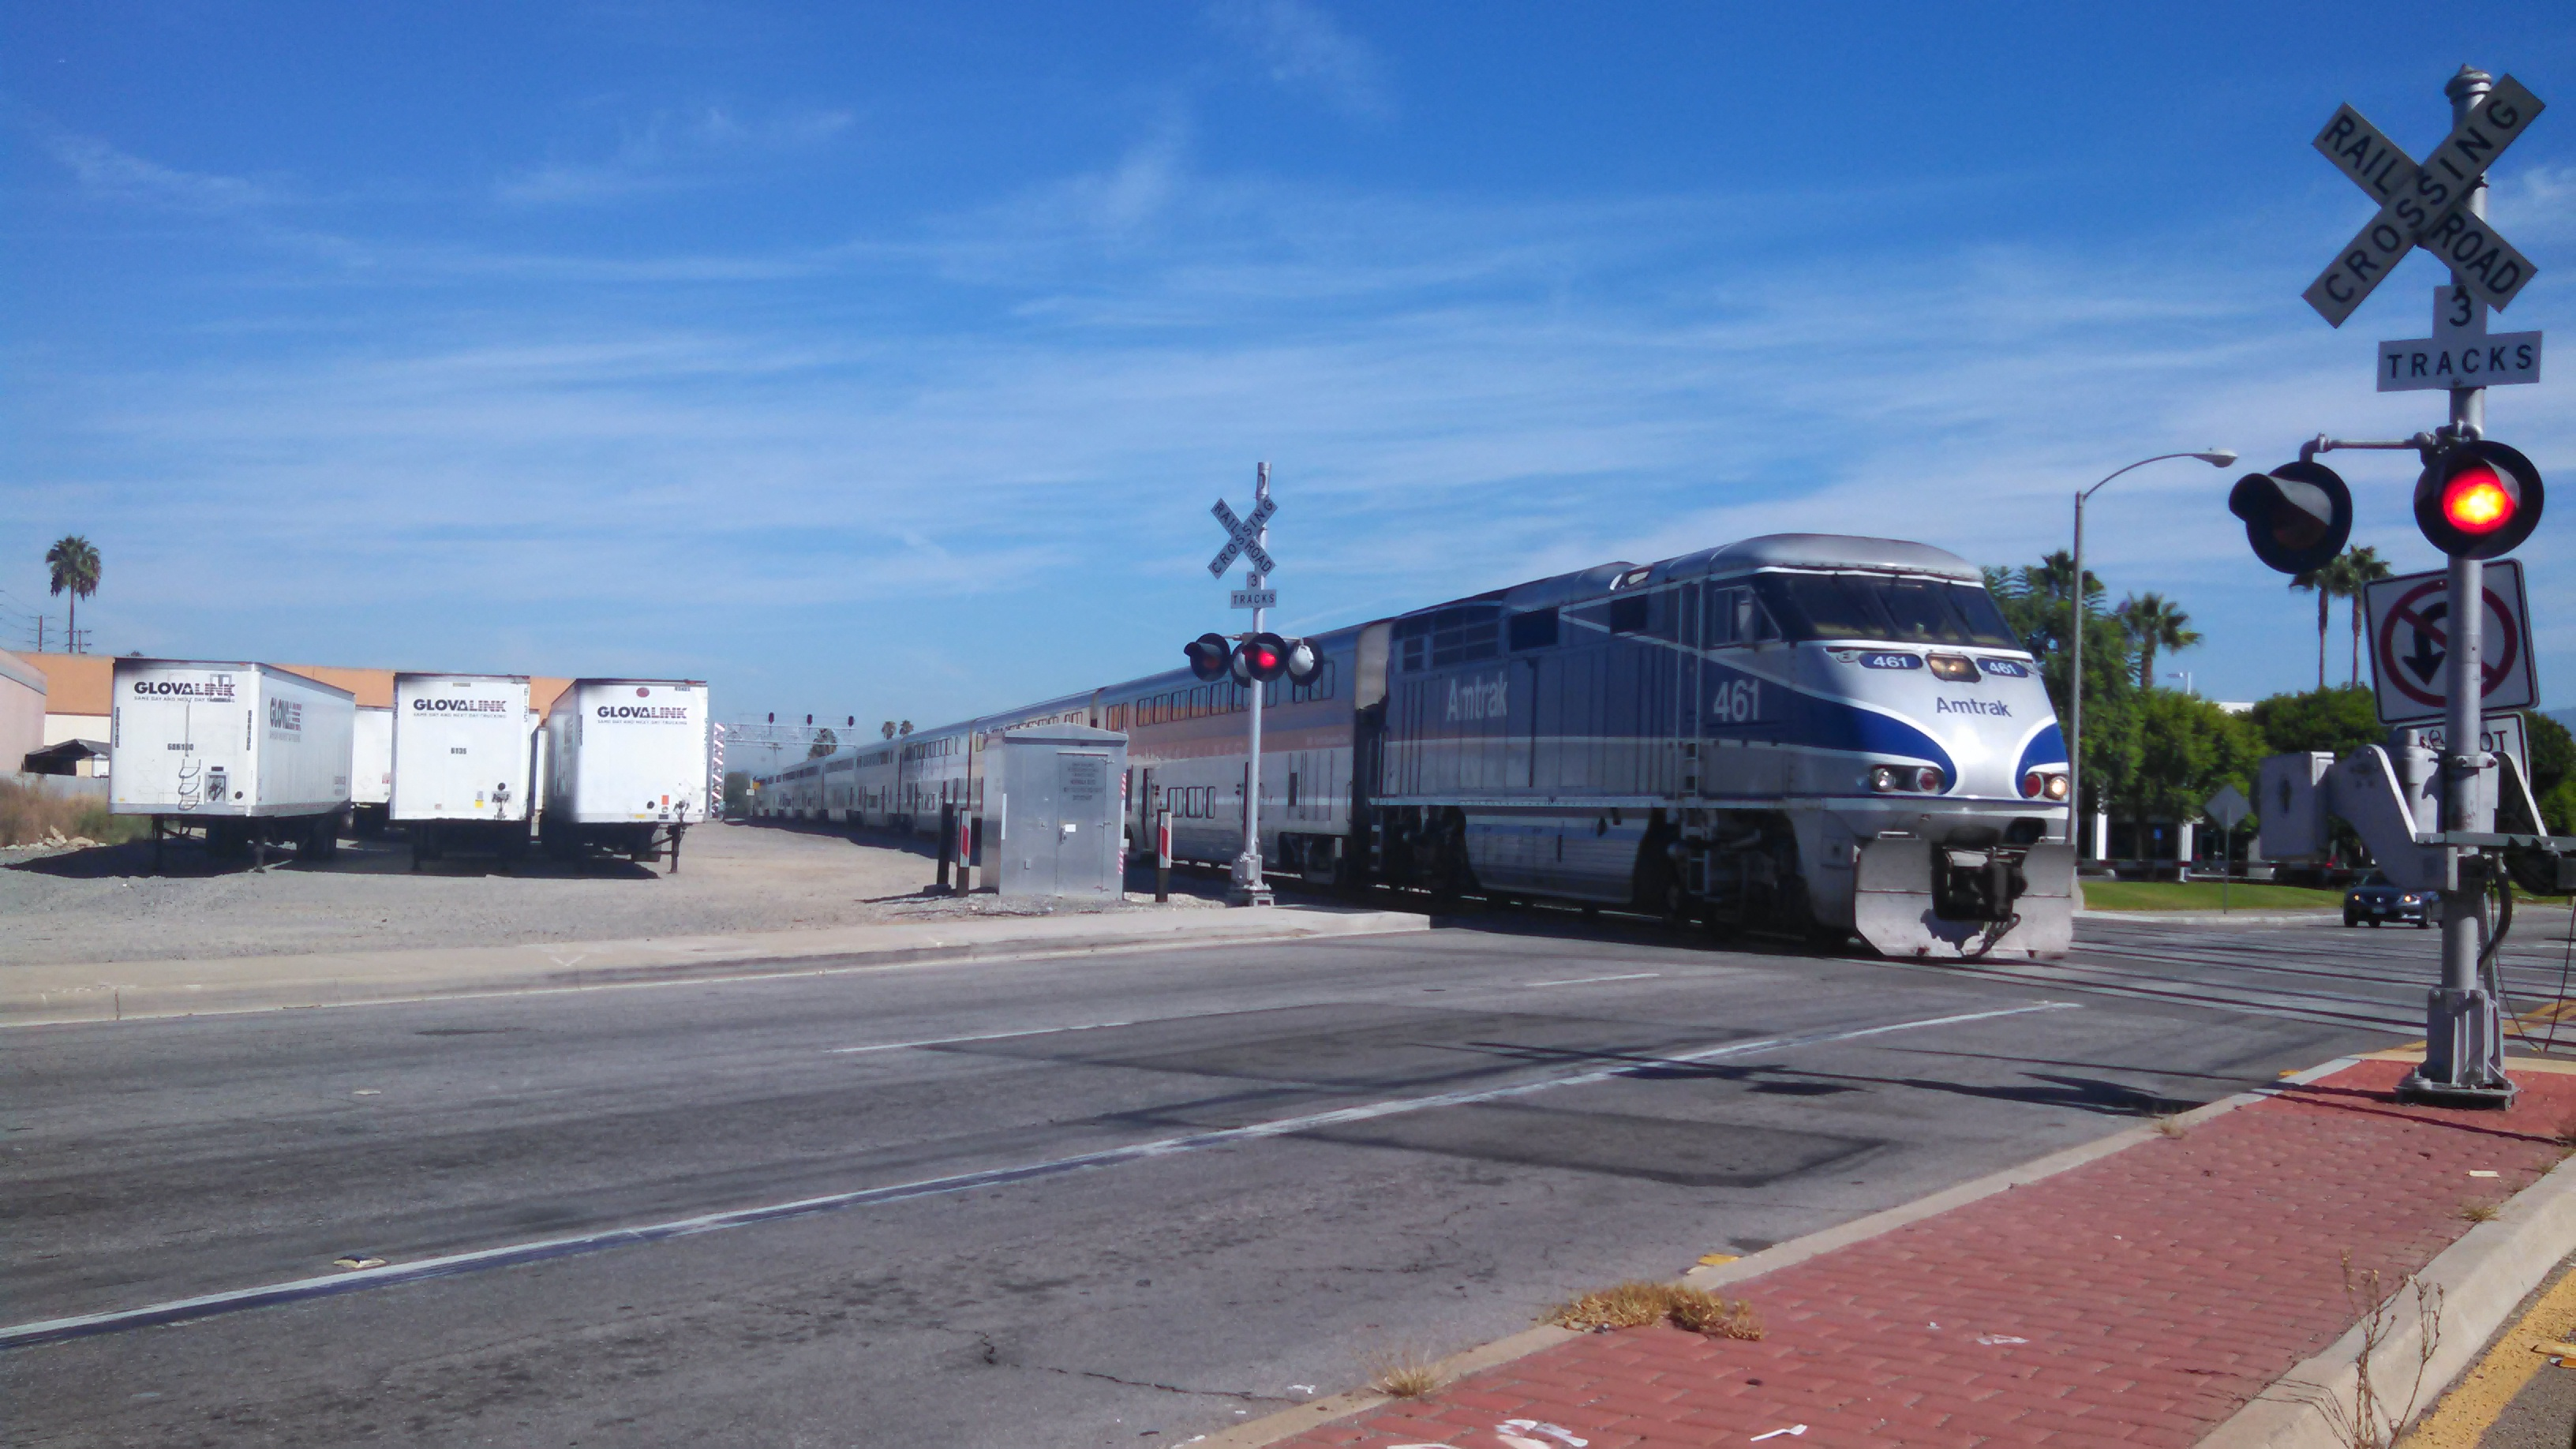 File:Amtrak train passing on BNSF tracks in Santa Fe Springs